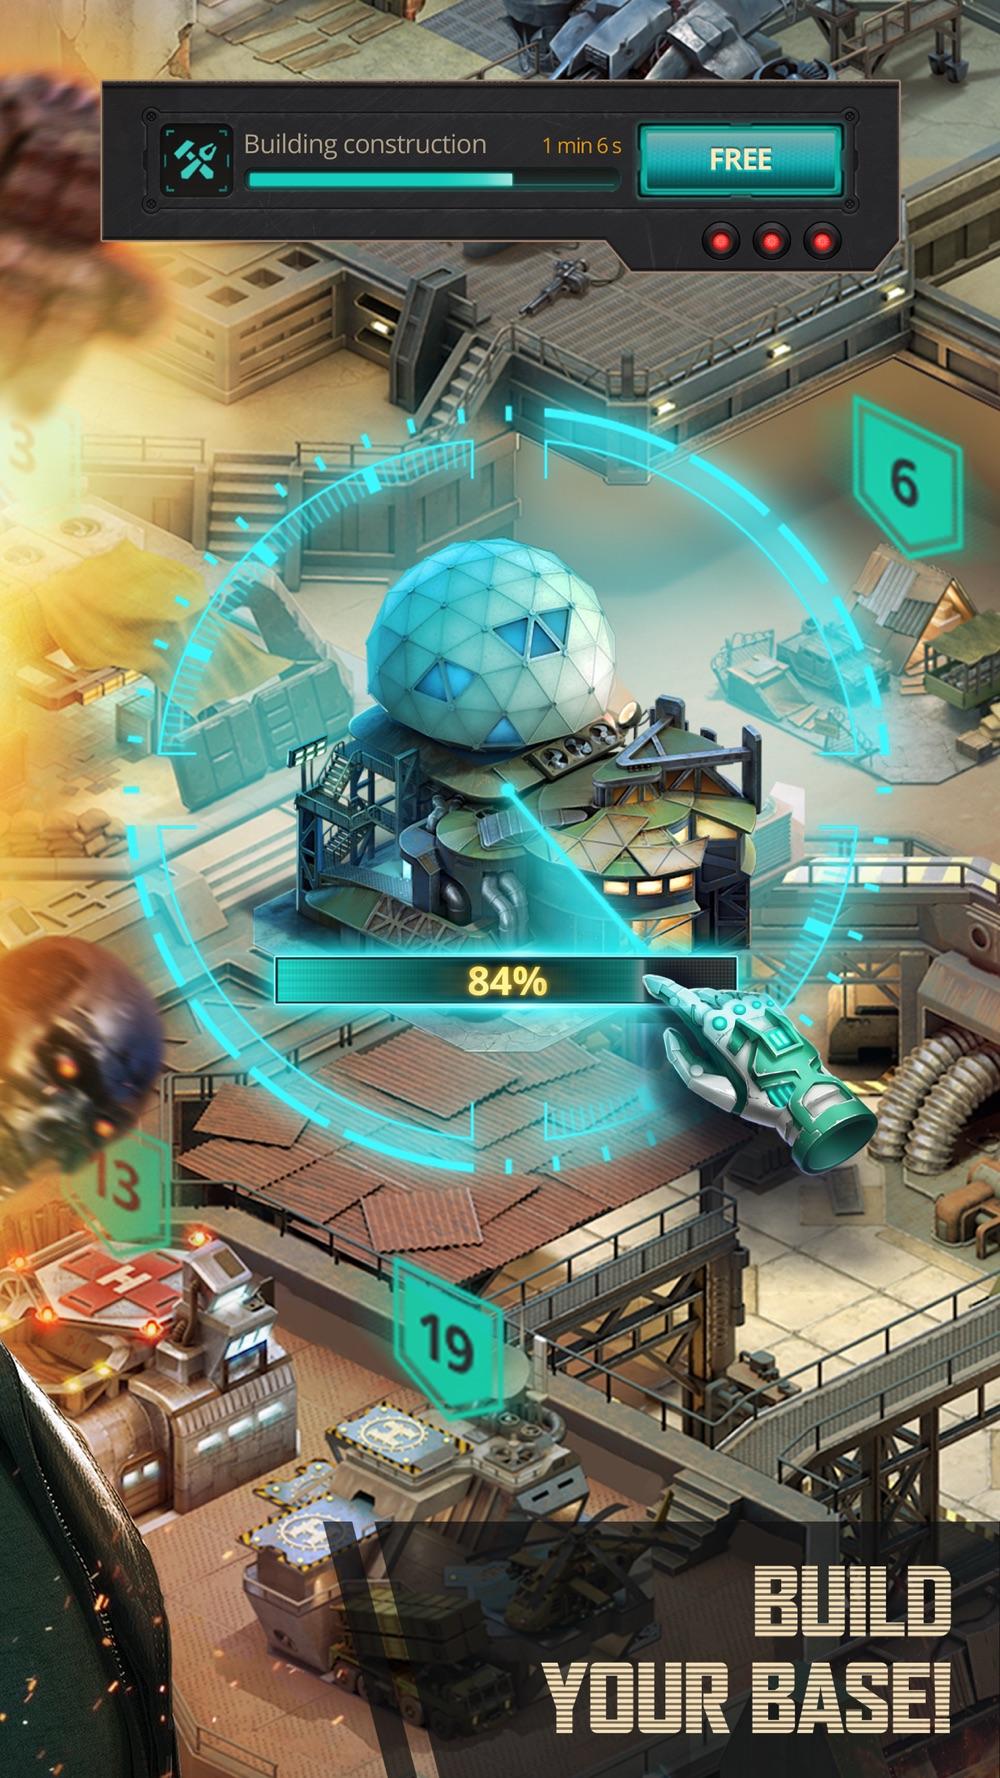 Terminator Genisys: Future War hack tool